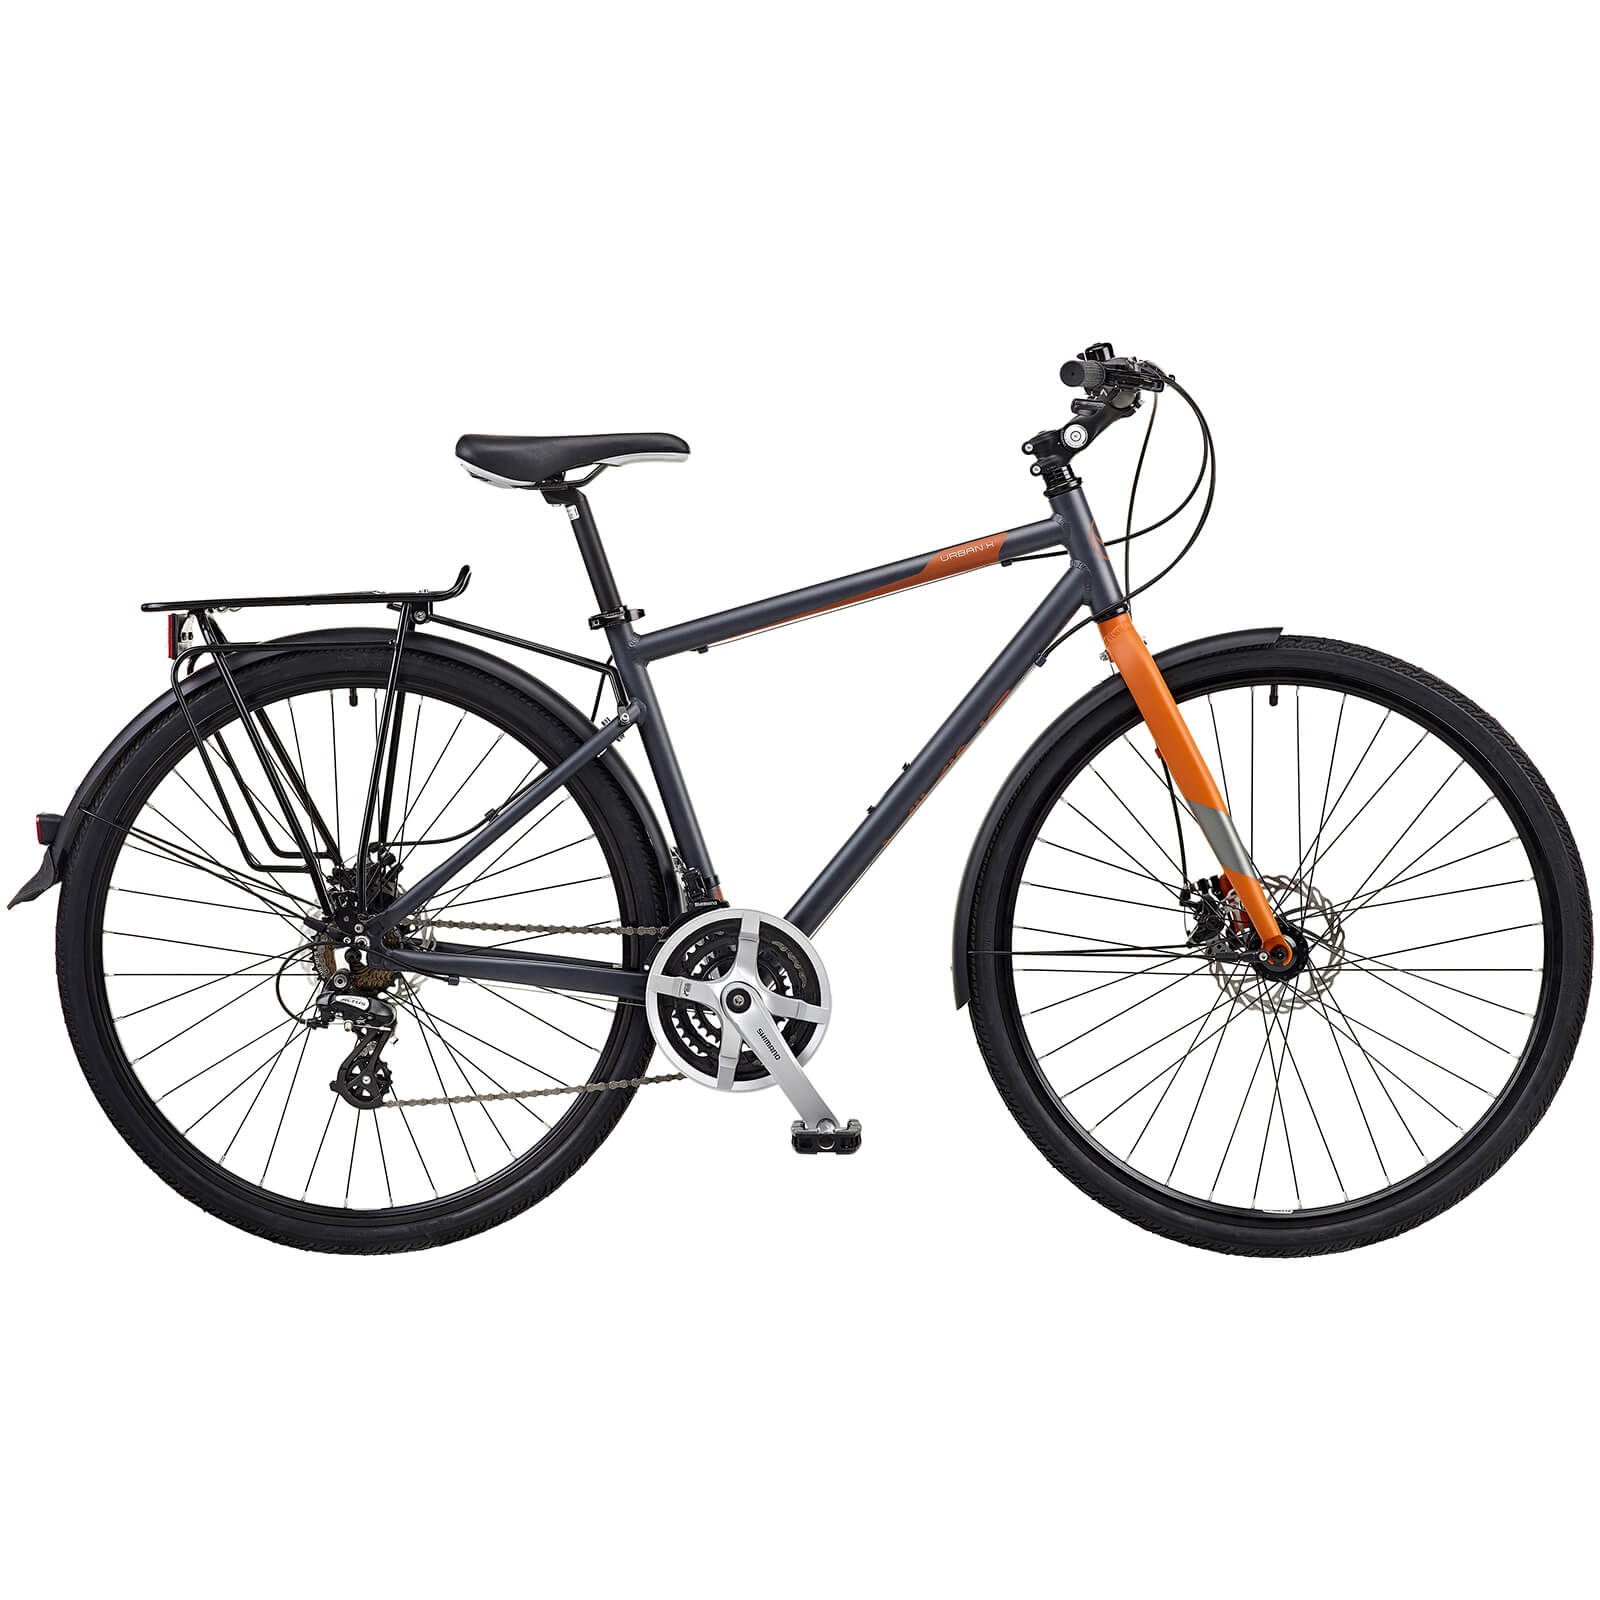 Viking Urban-X Gents 21sp Aluminium Trekking Bike 700c Wheel